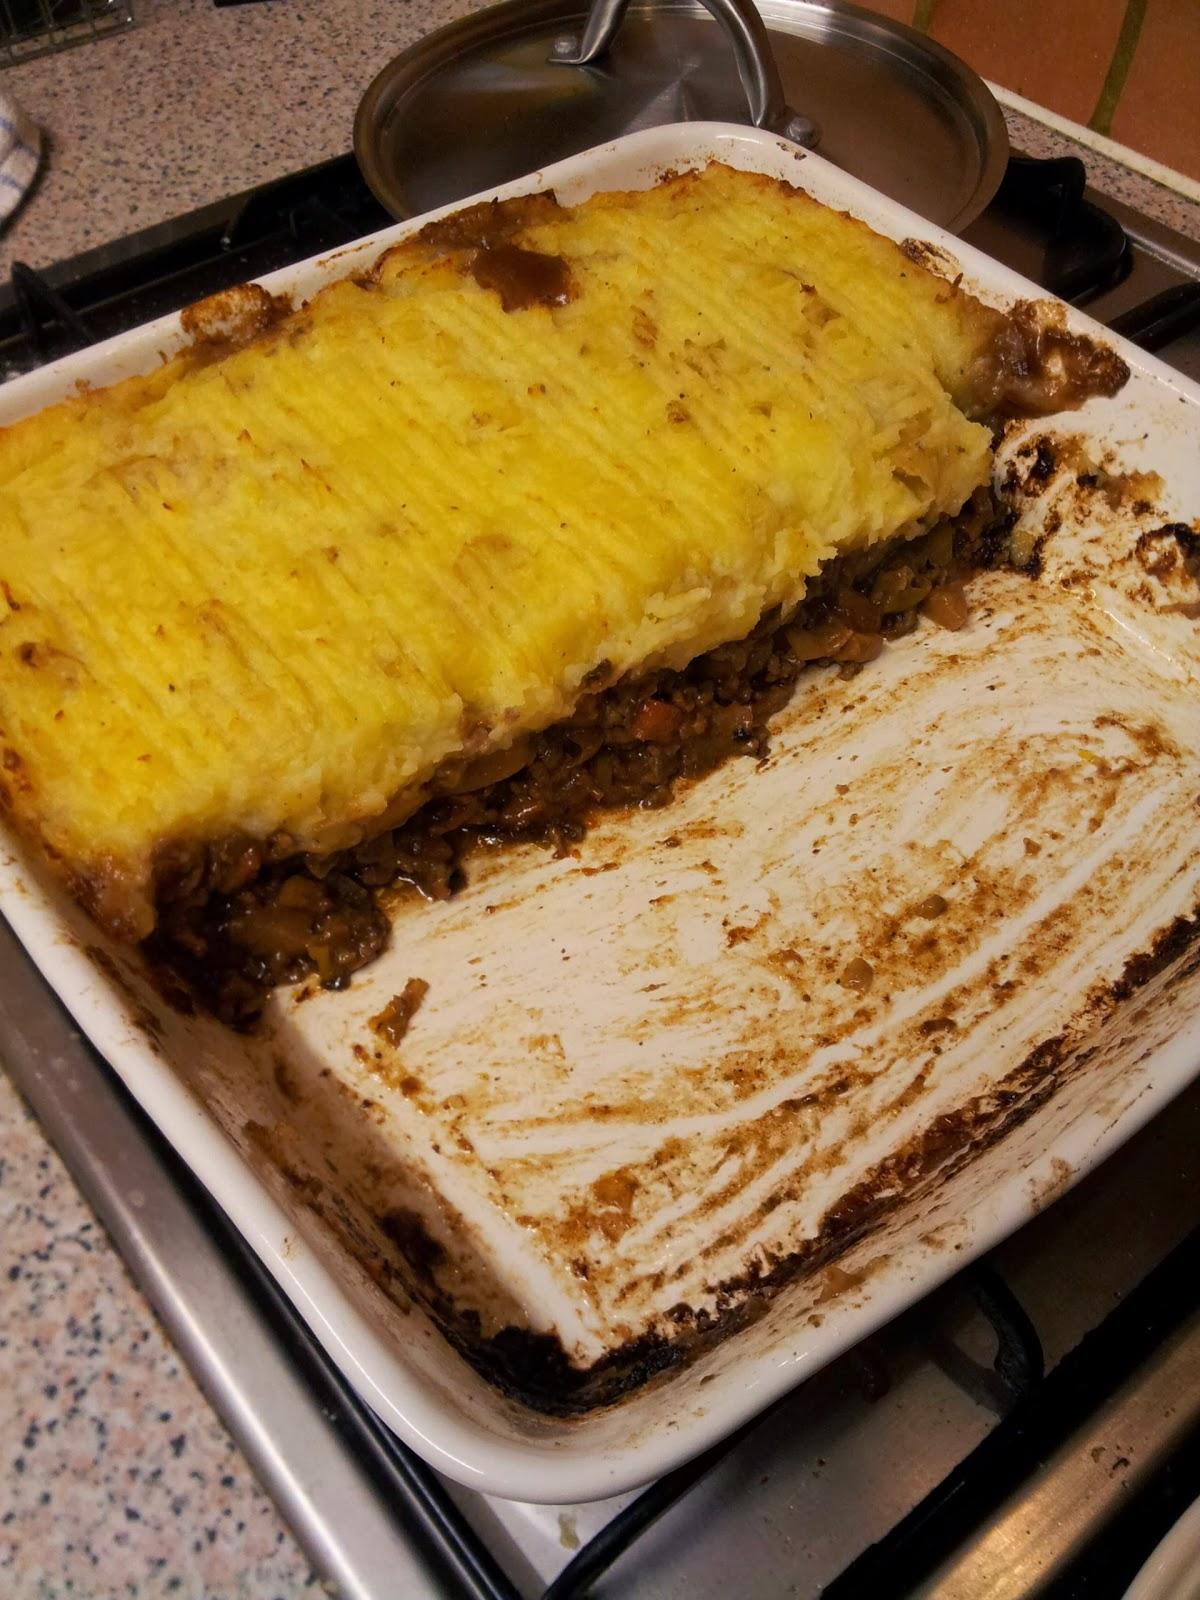 Shepherd's or Cottage Pie